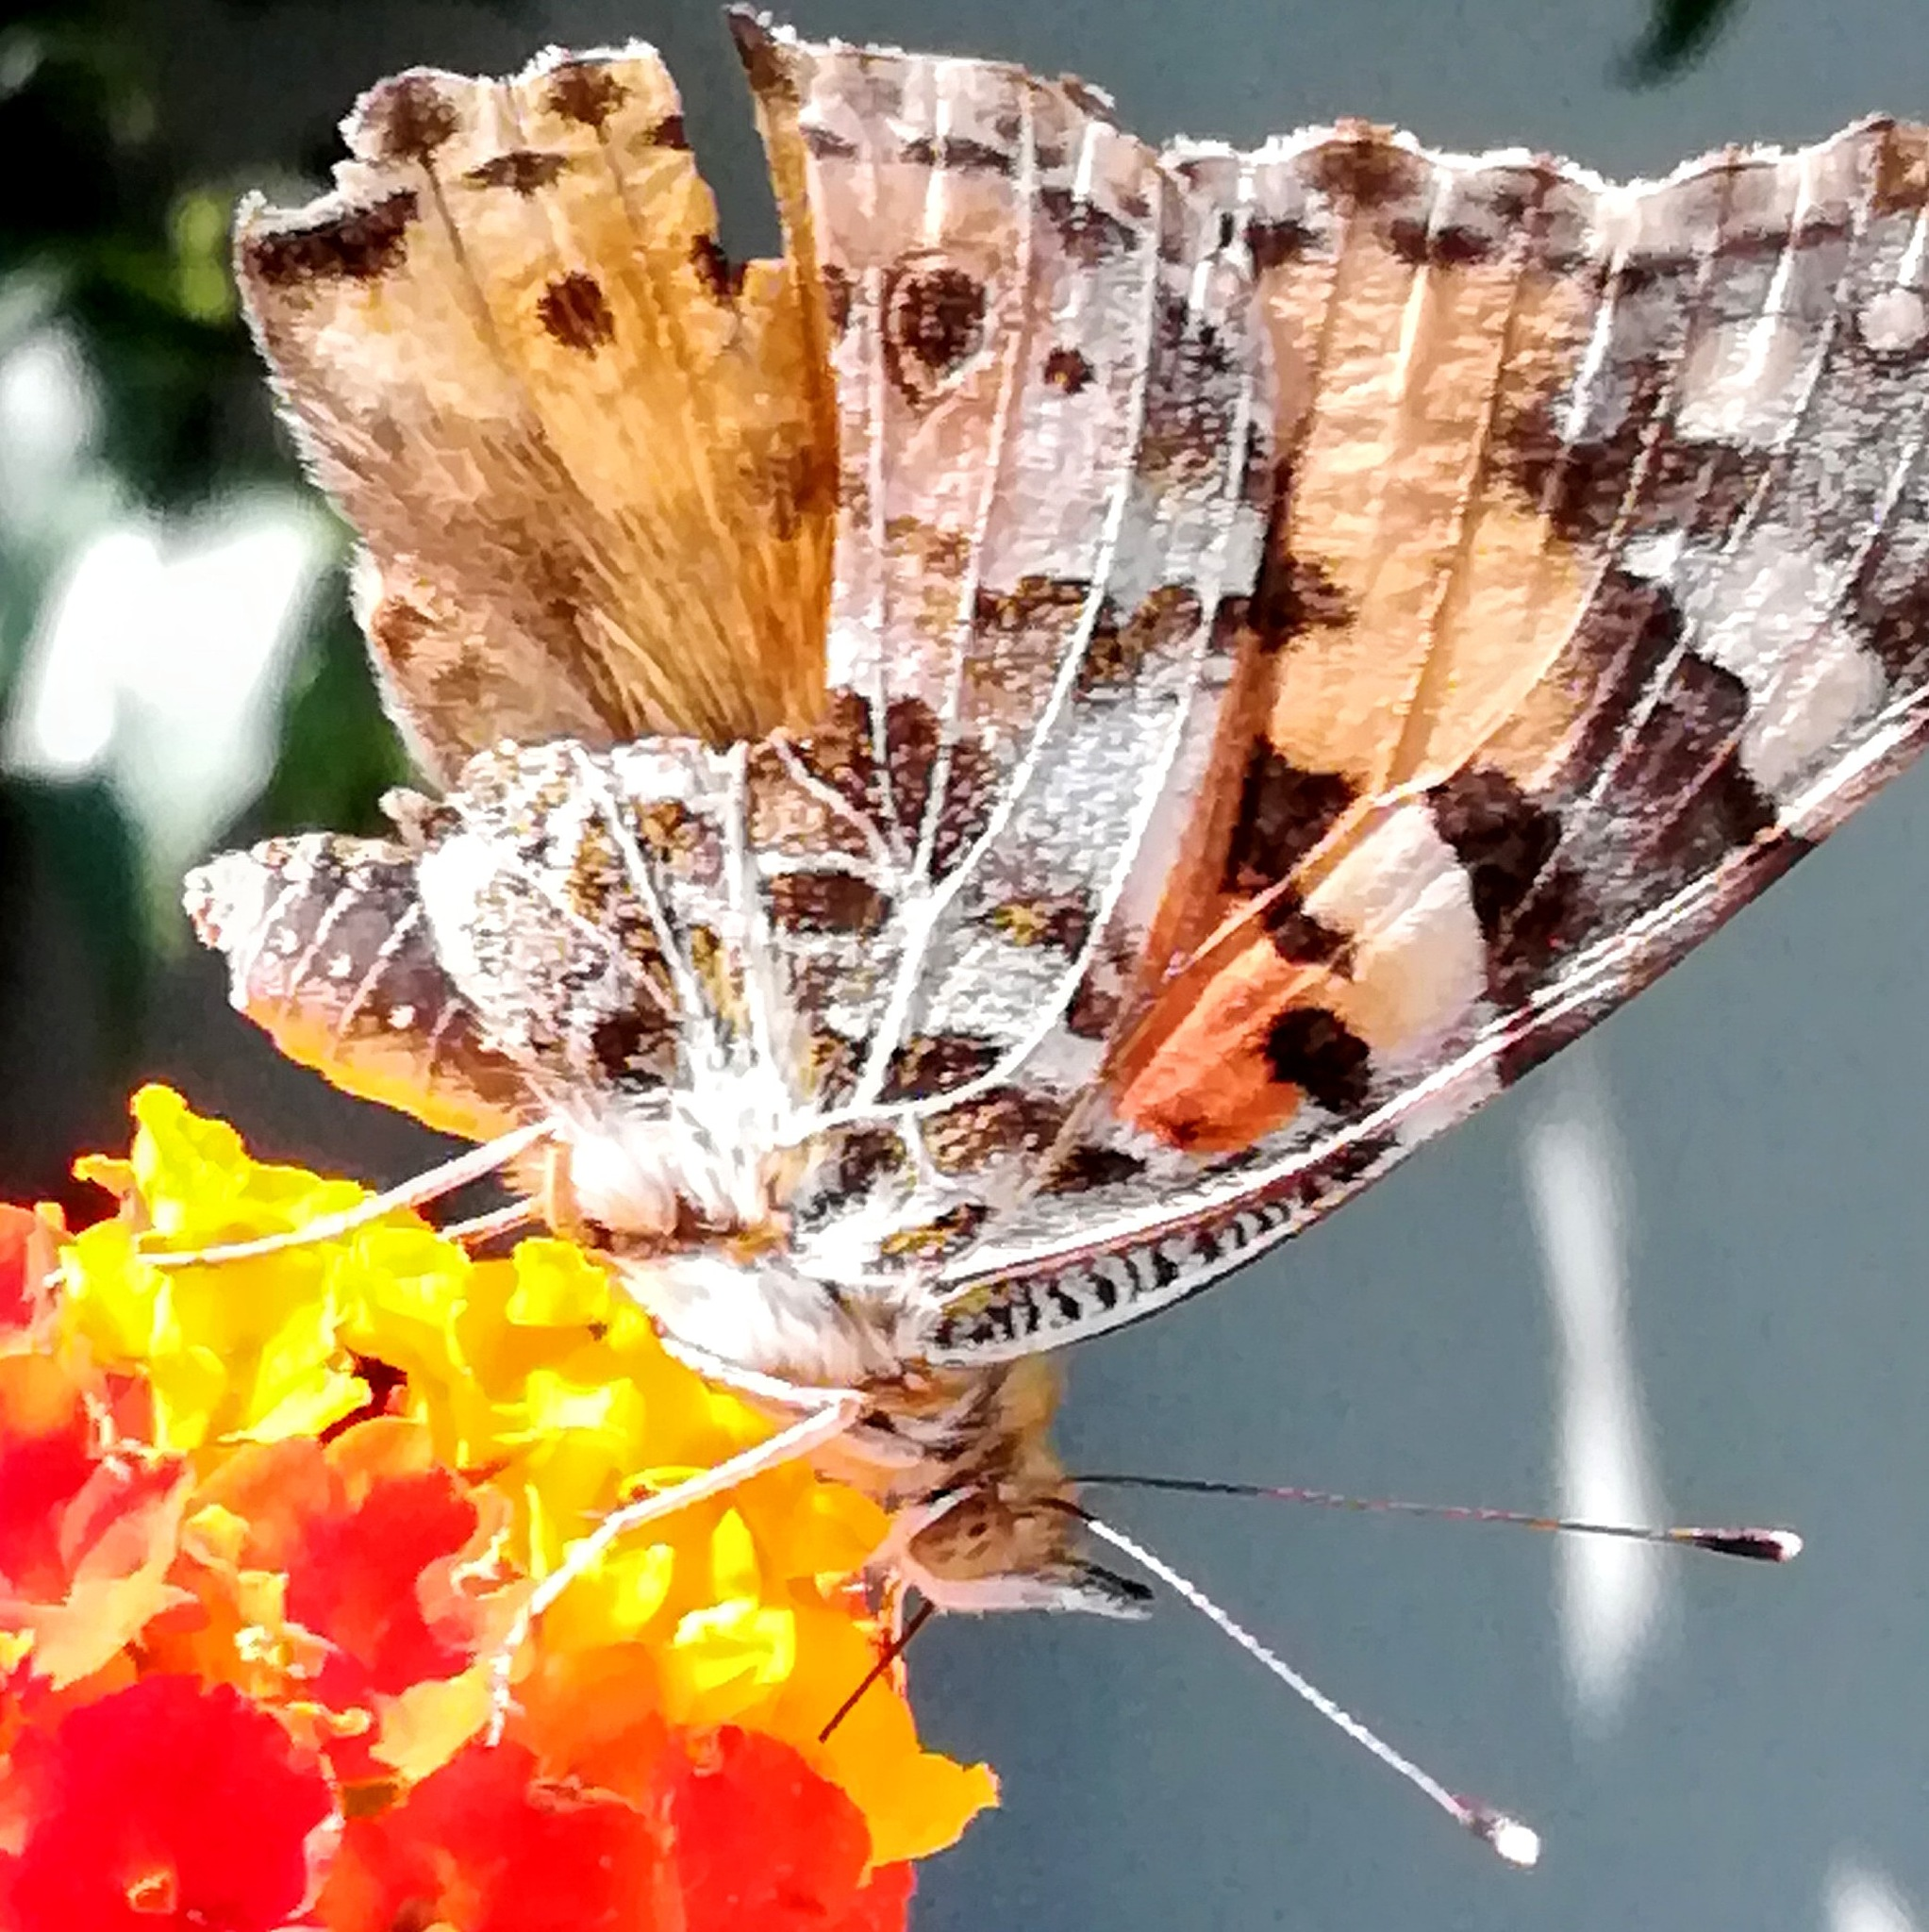 Vanessa#2 on Lantana flower -CC BY 4.0 Gianni Del Bufalo by gianni del bufalo